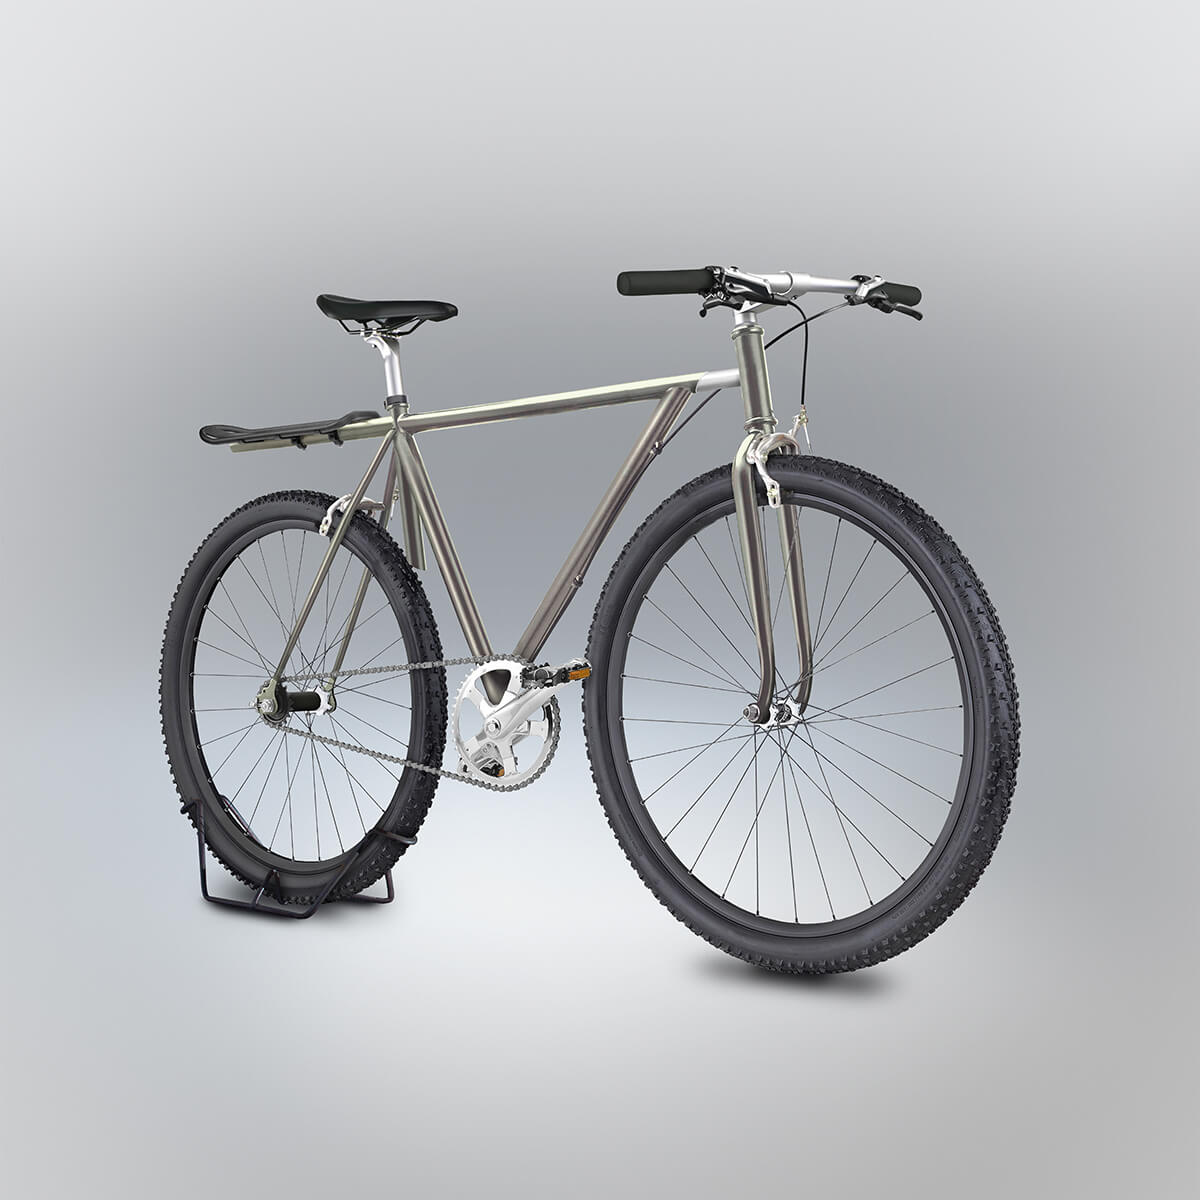 gianluca-gimini-bikes-20